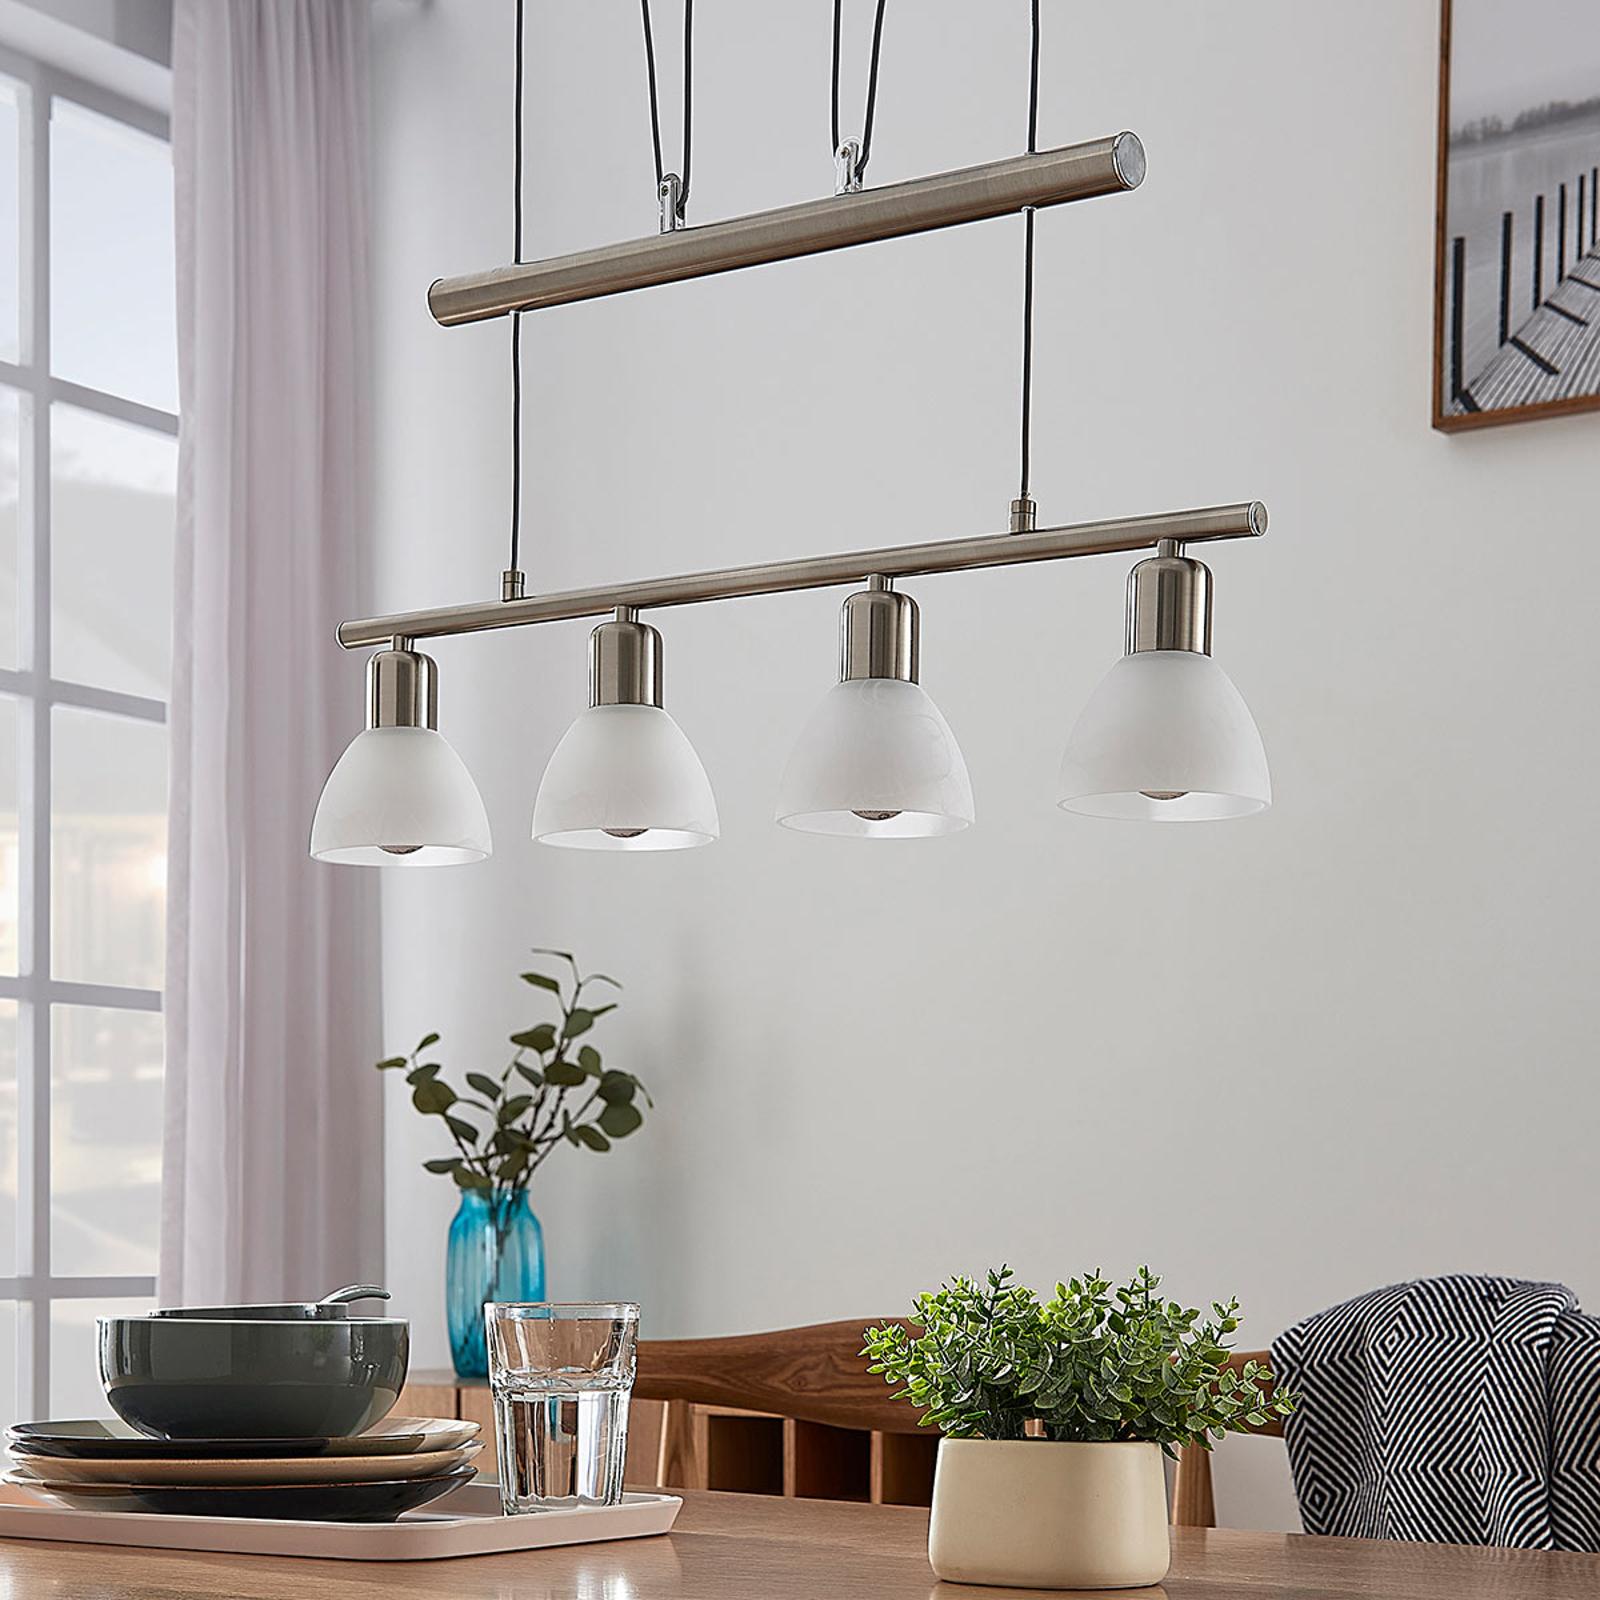 Høydejusterbar LED-pendellampe Gwendolin, bjelke